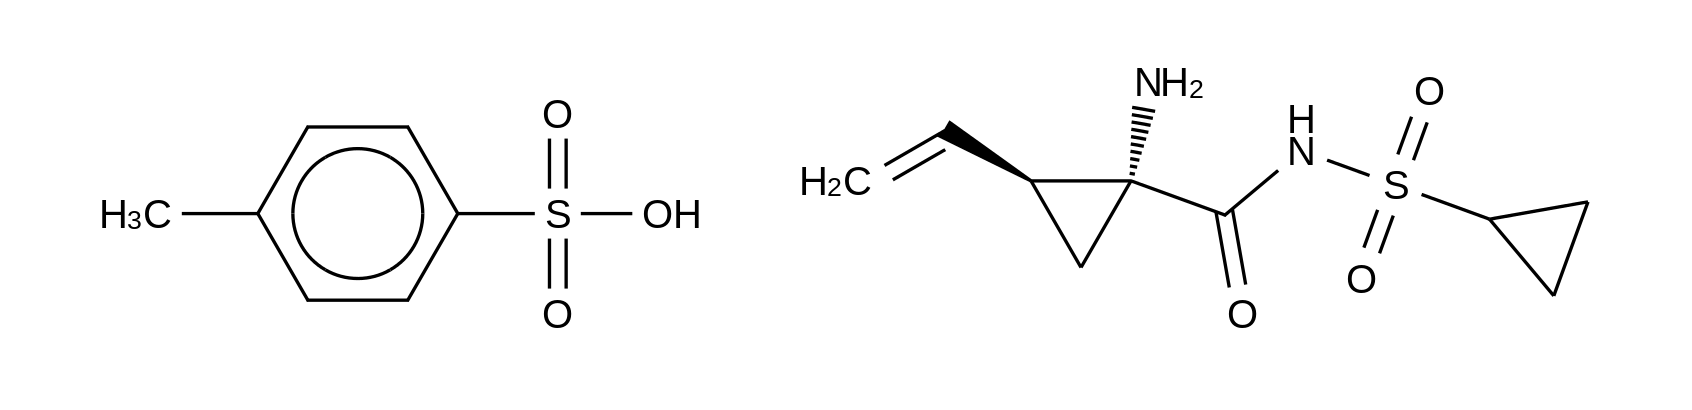 (1R,2S)-1-Amino-N-(cyclopropylsulfonyl)-2-ethenylcyclopropanecarboxamide 4-methylbenzenesulfonate (1:1)